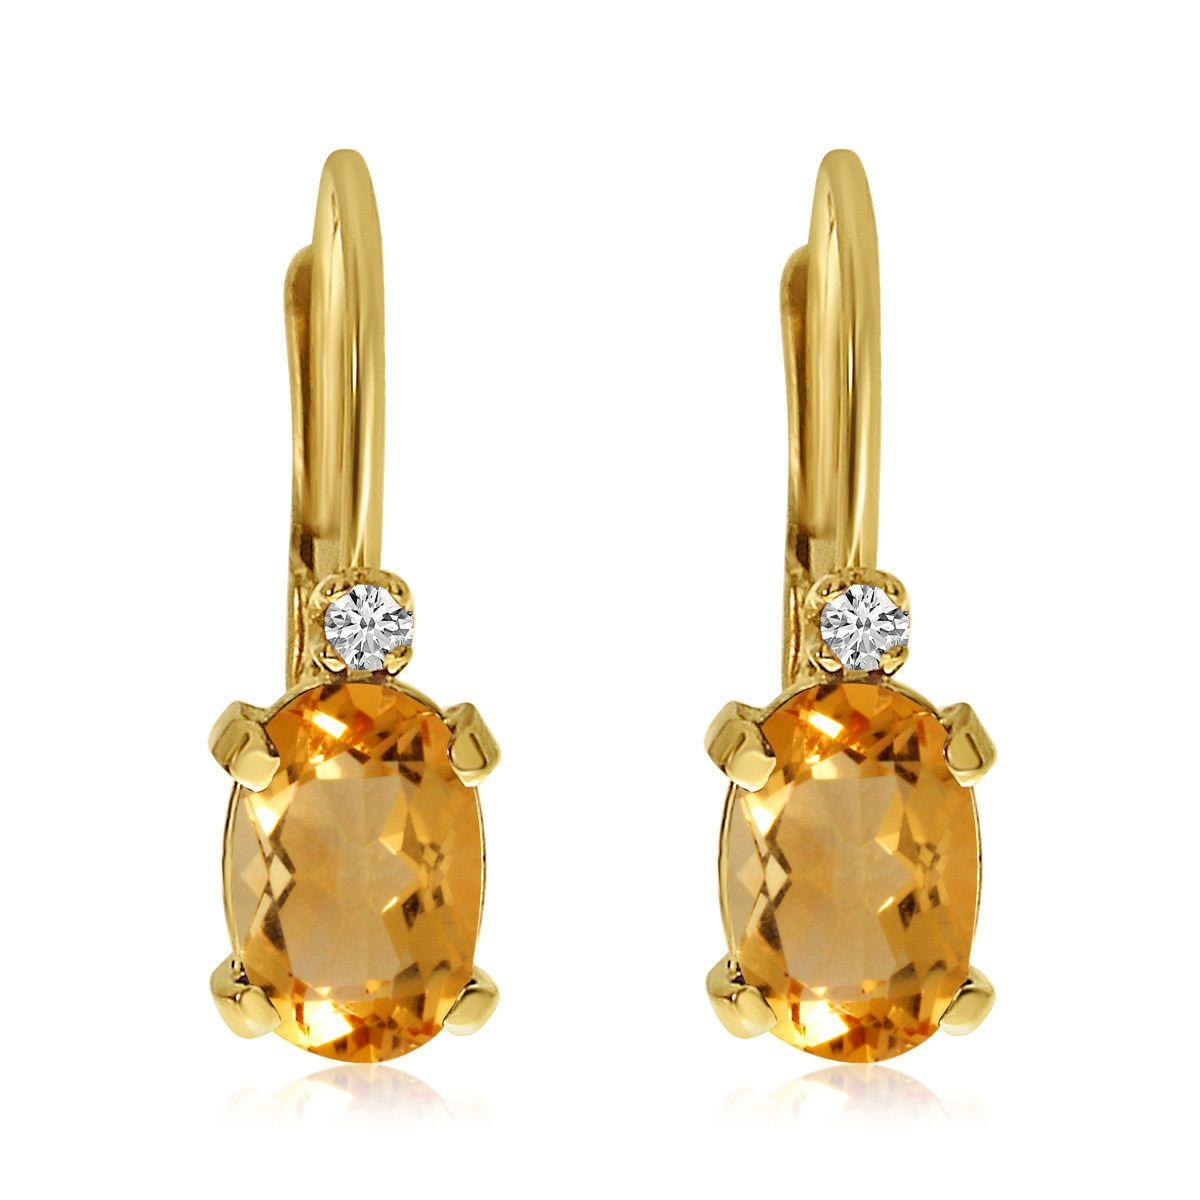 169 99 14k Yellow Gold Oval Citrine And Diamond Leverback Earrings Otoo Travel Portfolio